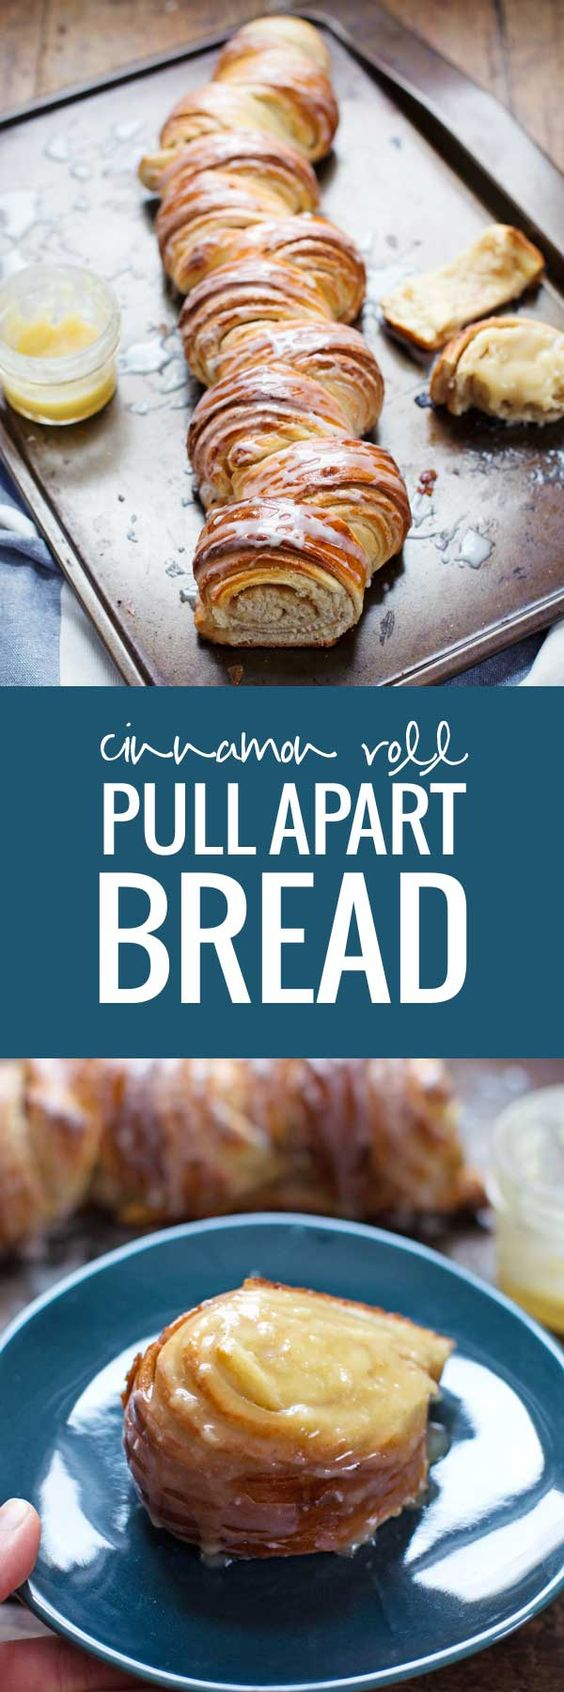 ... pull apart bread pull apart cinnamon rolls cinnamon breads homemade